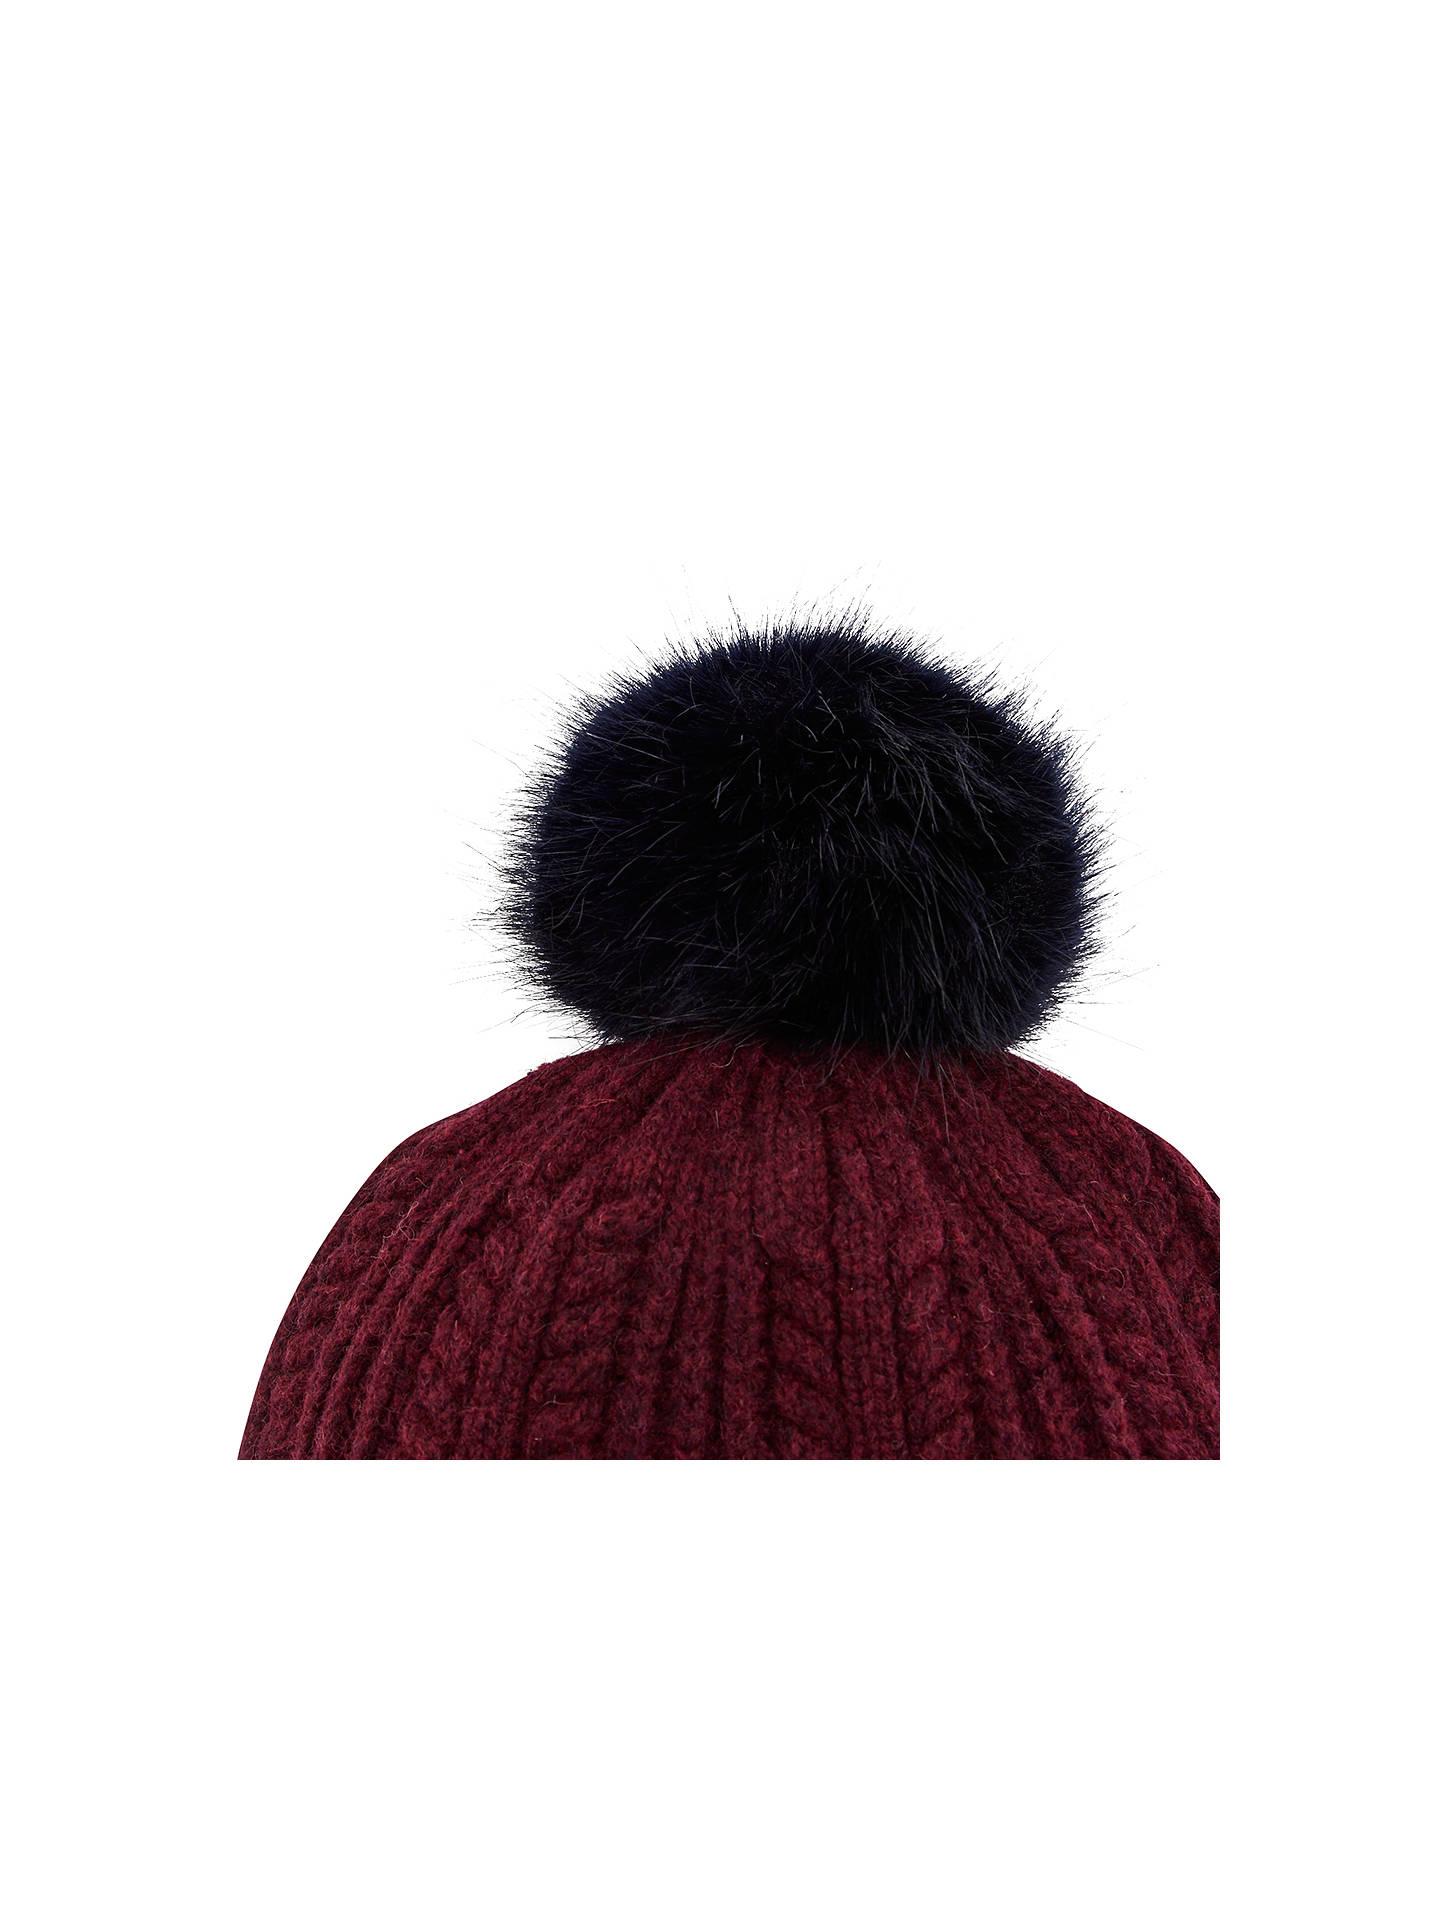 Joules Faux Fur Bobble Pom Pom Beanie Hat at John Lewis   Partners 9498ea29f9b